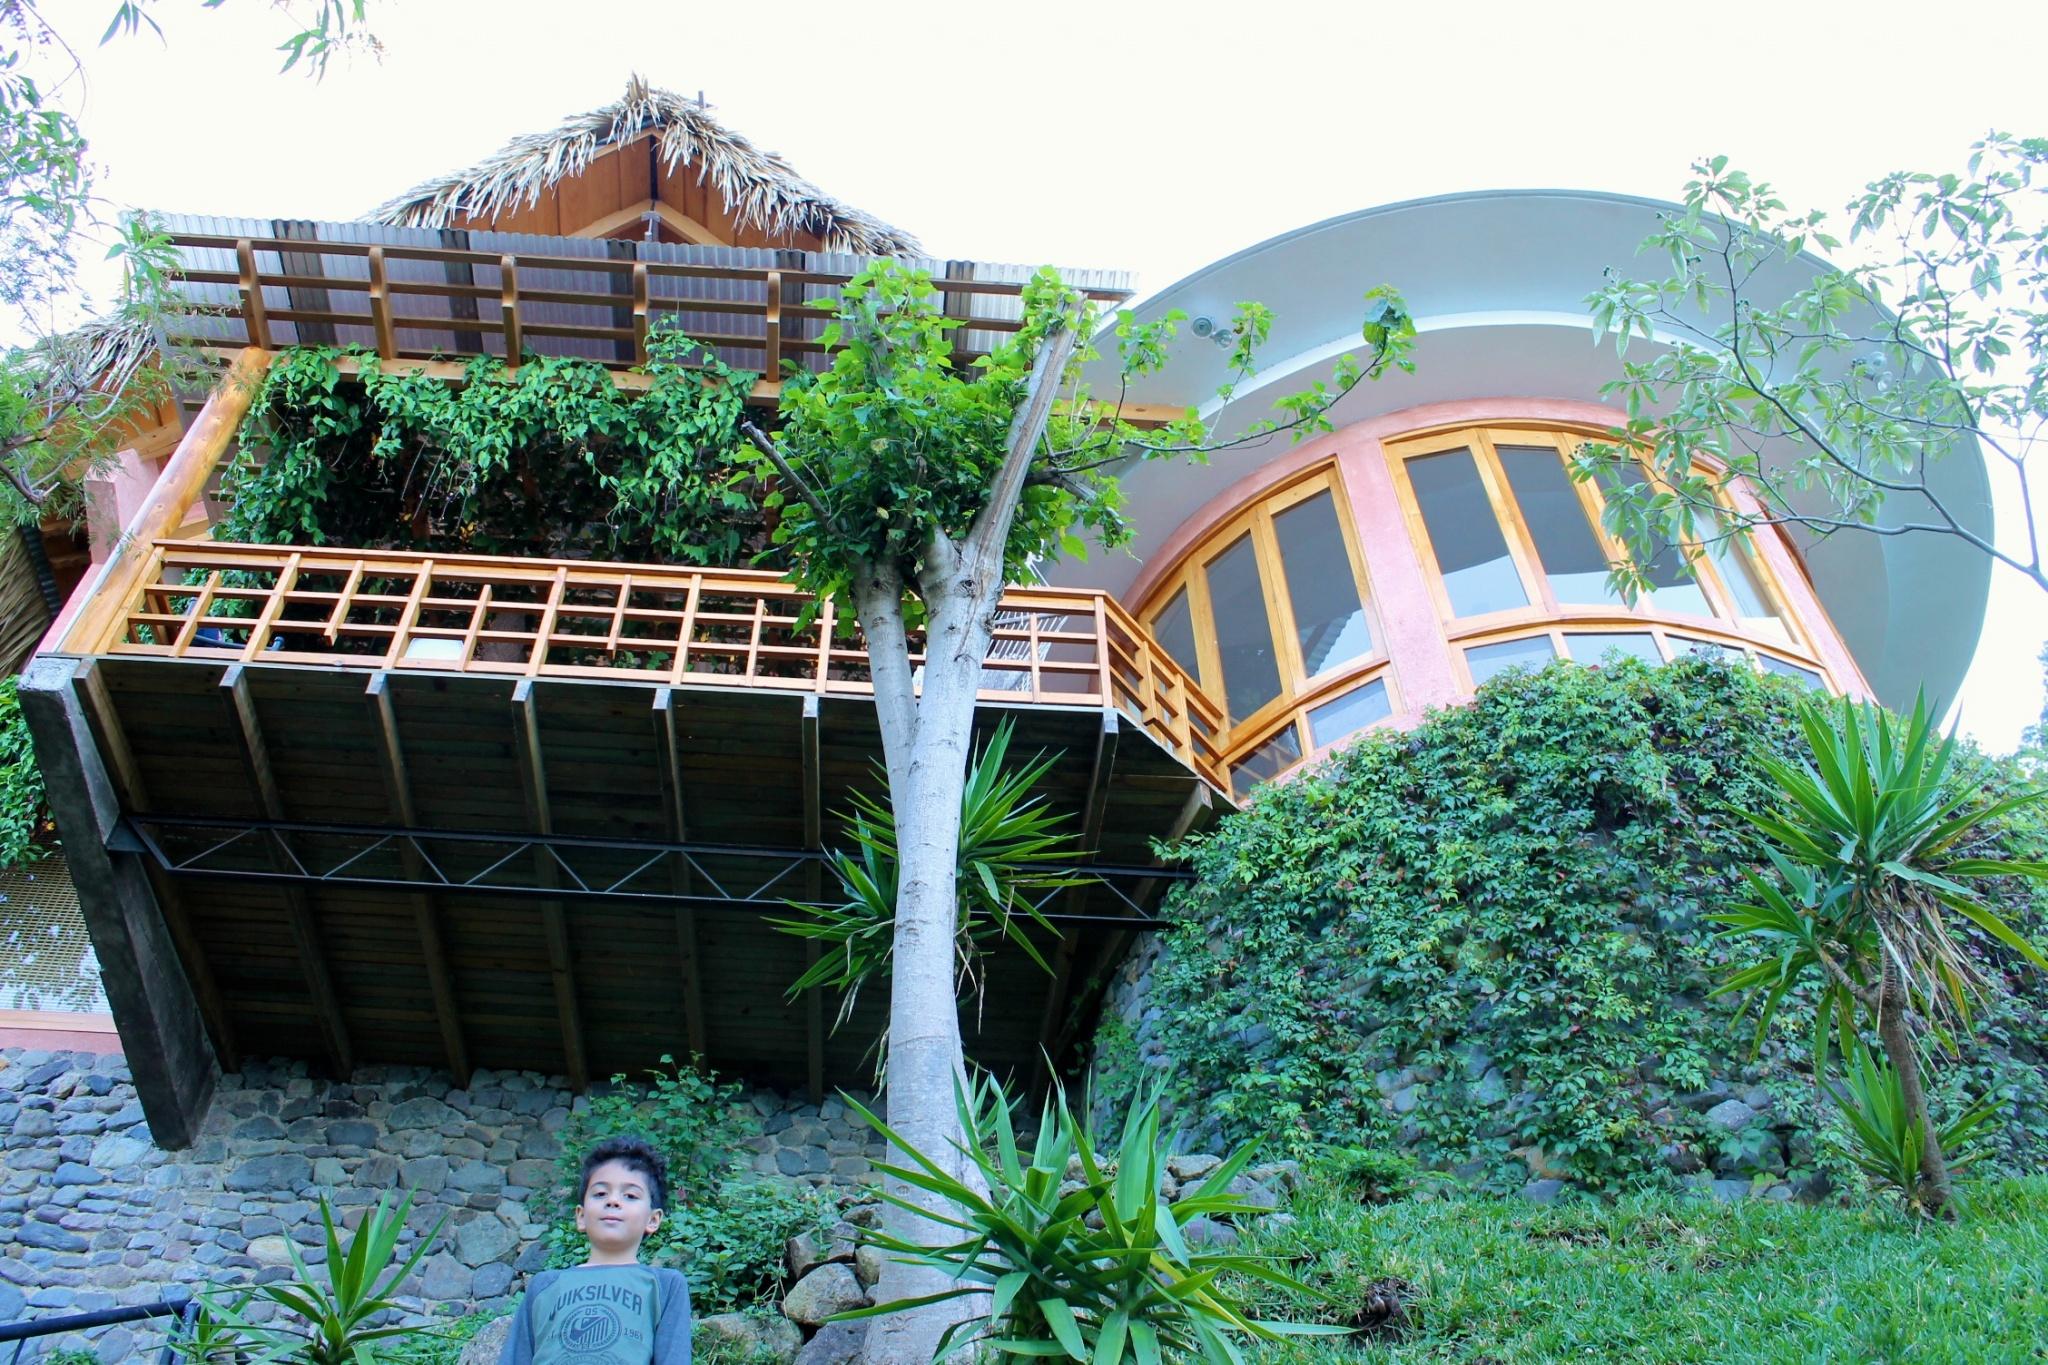 Villa B'alam Ya perched on the side of the mountain, Atitlan, Guatemala